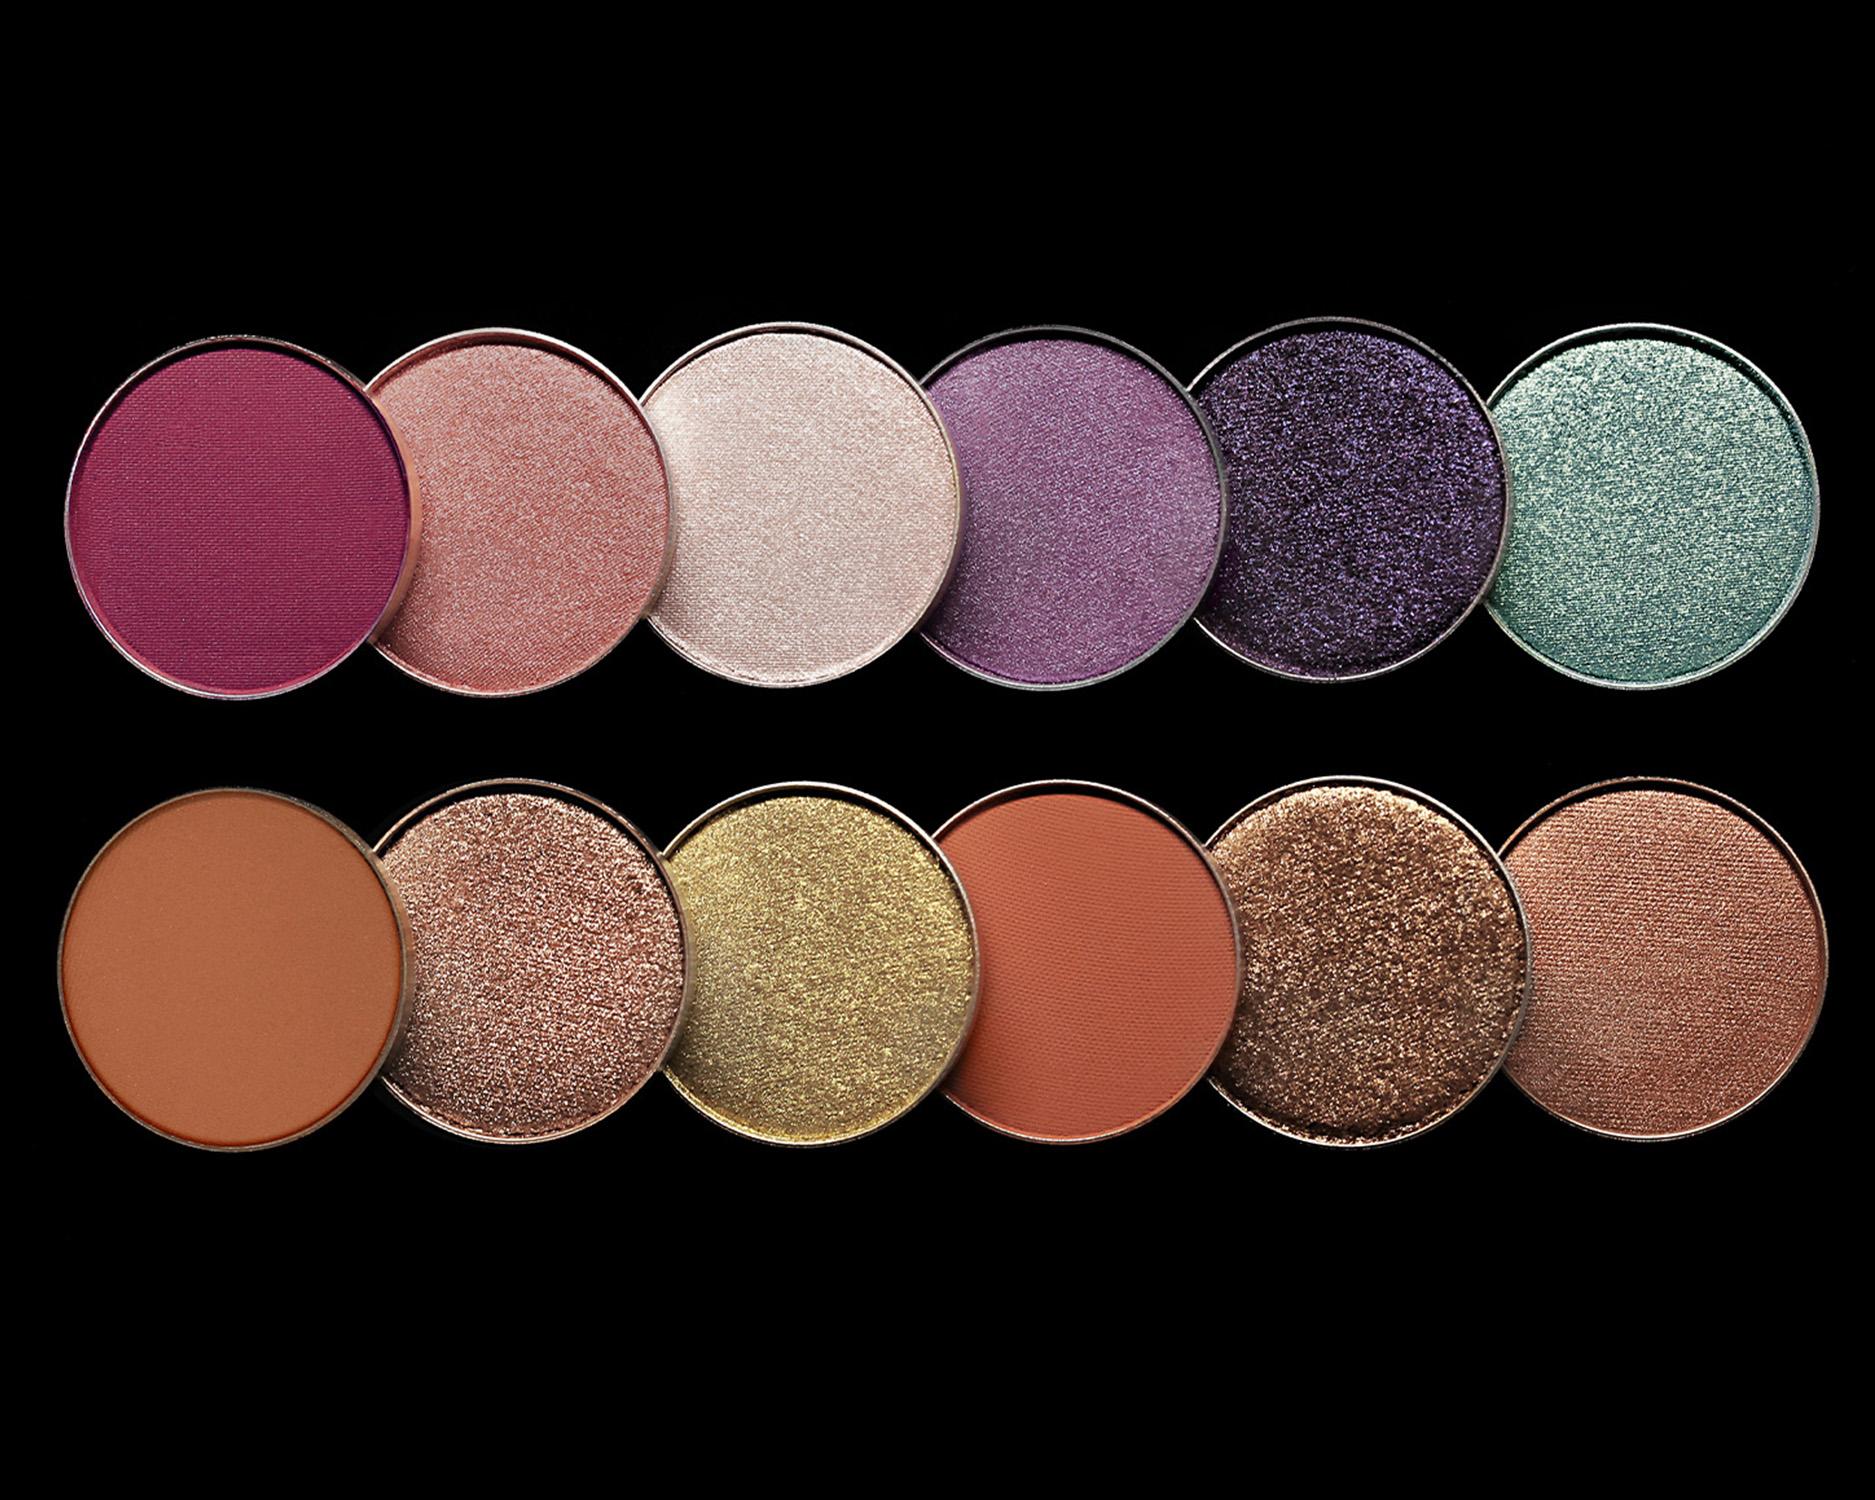 abh-eyeshadow-singles-1-12